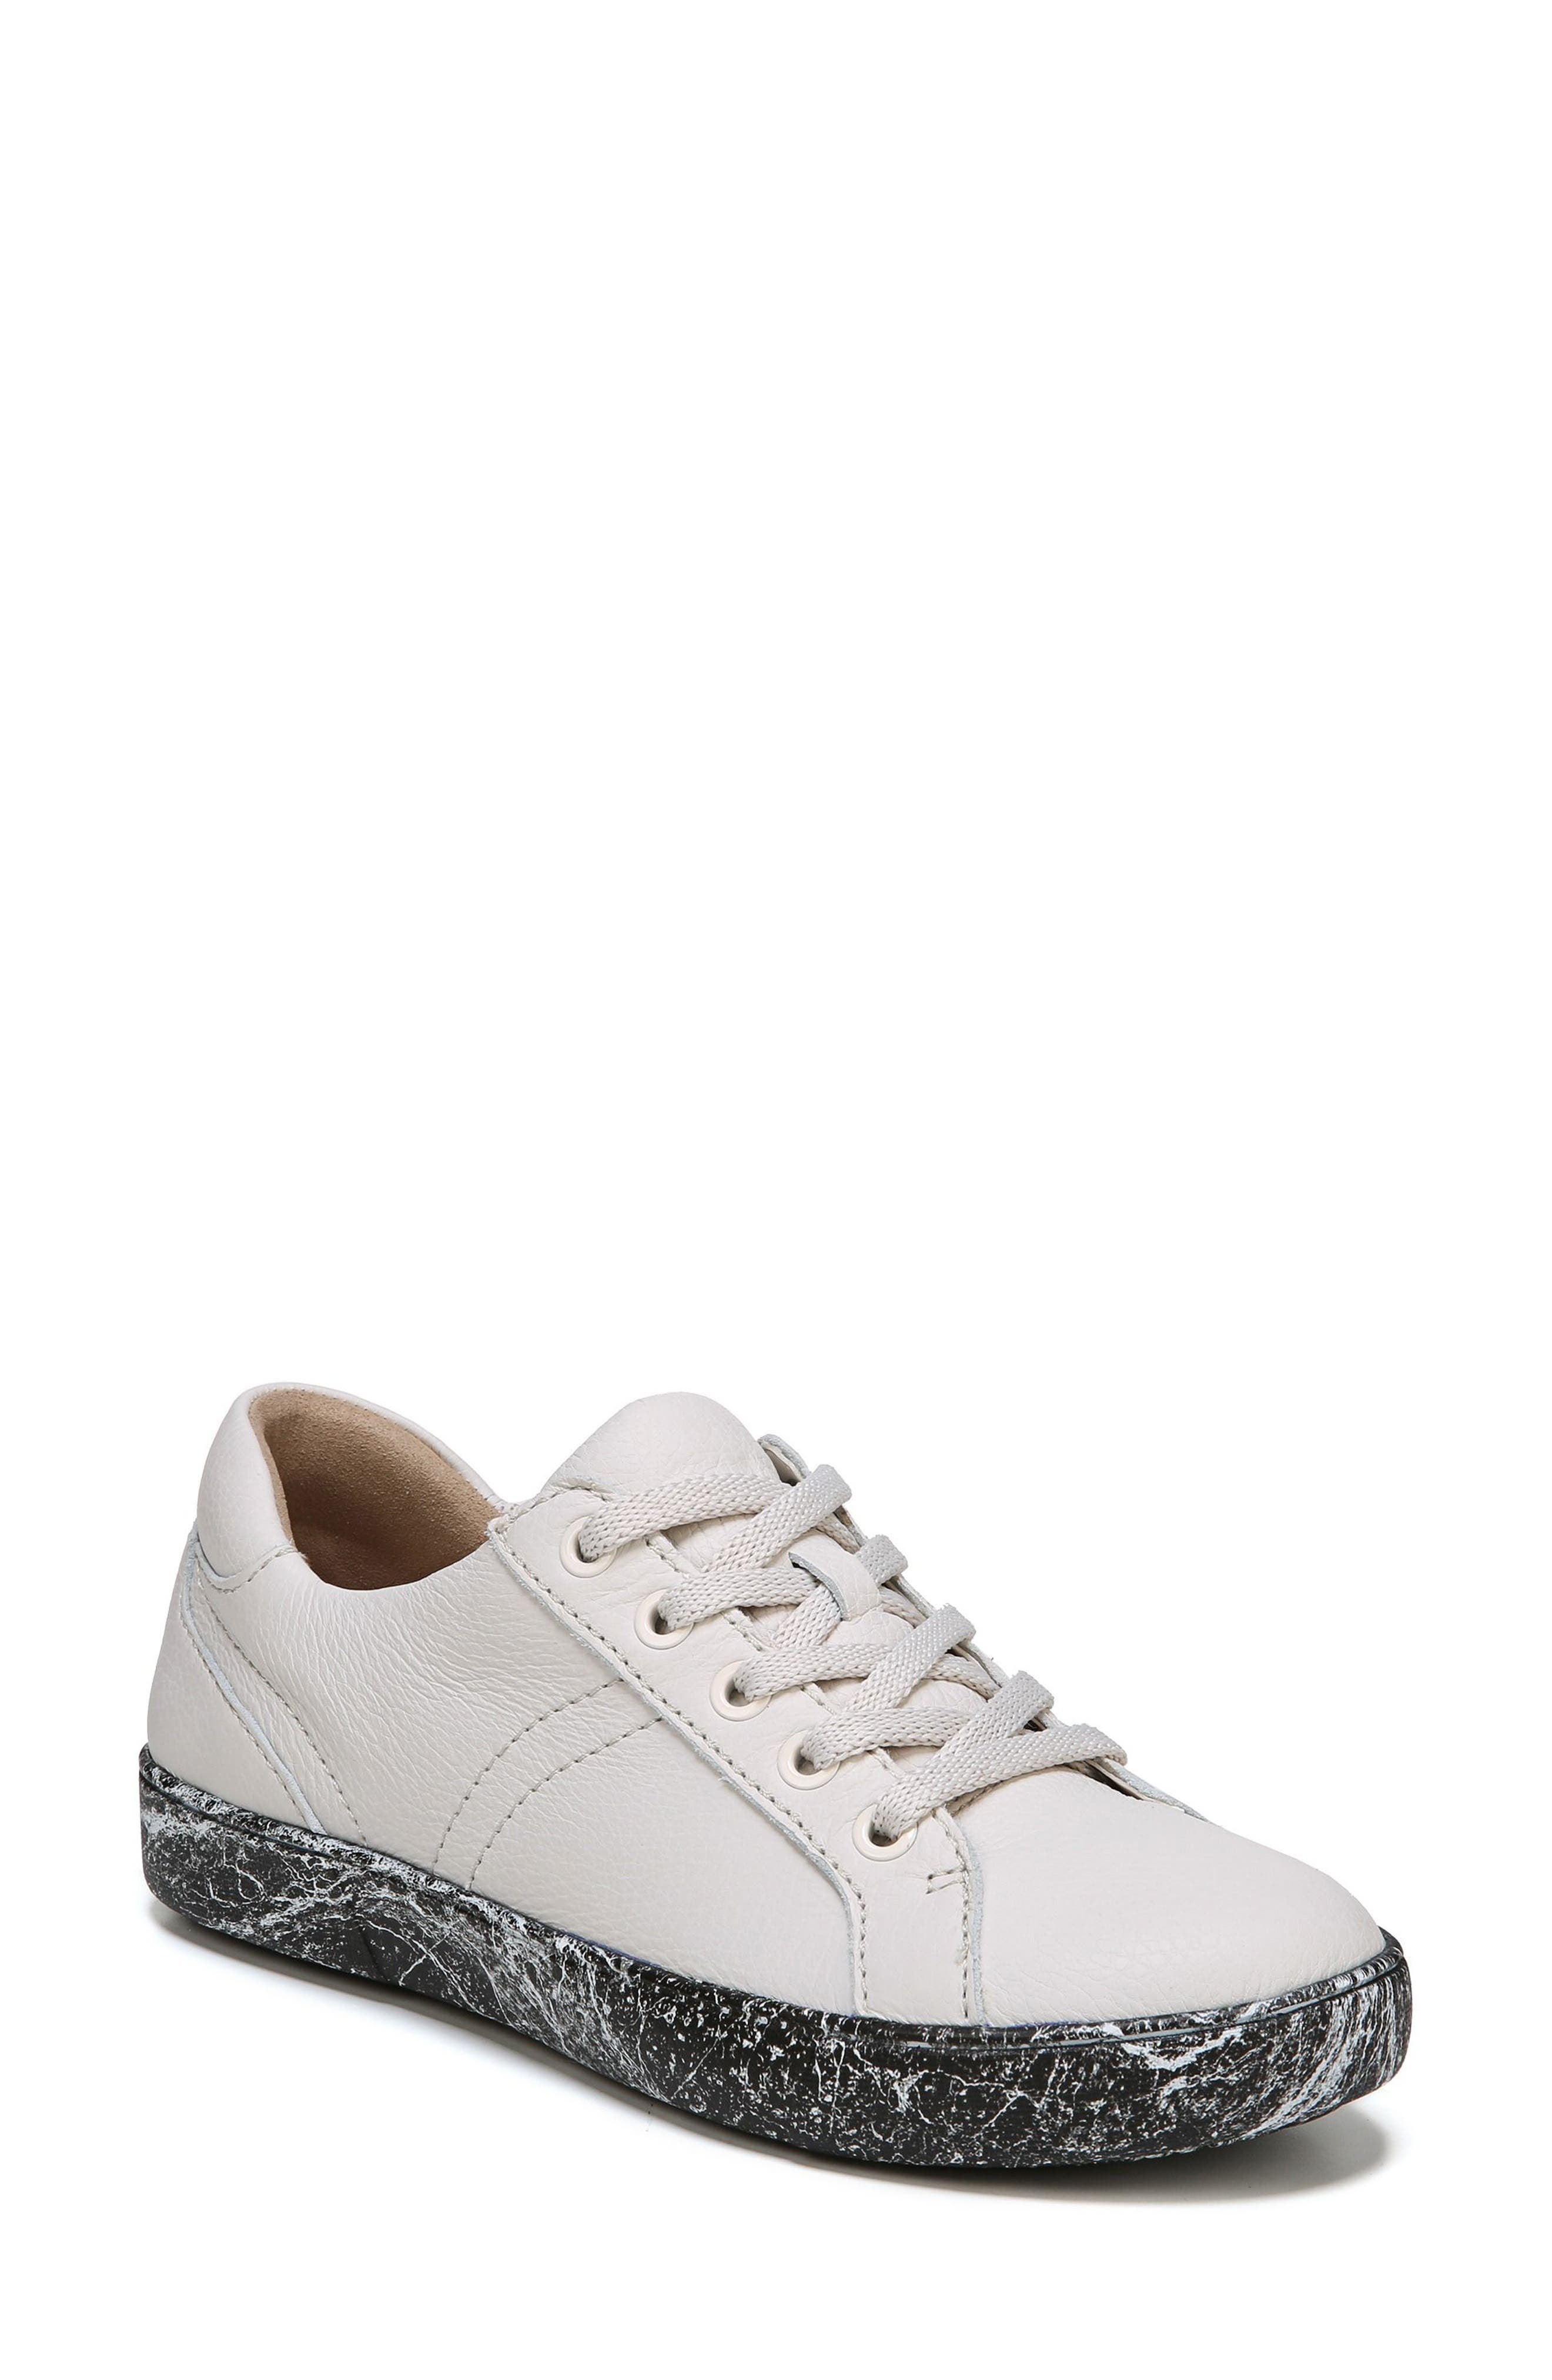 Morrison Sneaker,                         Main,                         color, Beige Pebble Leather